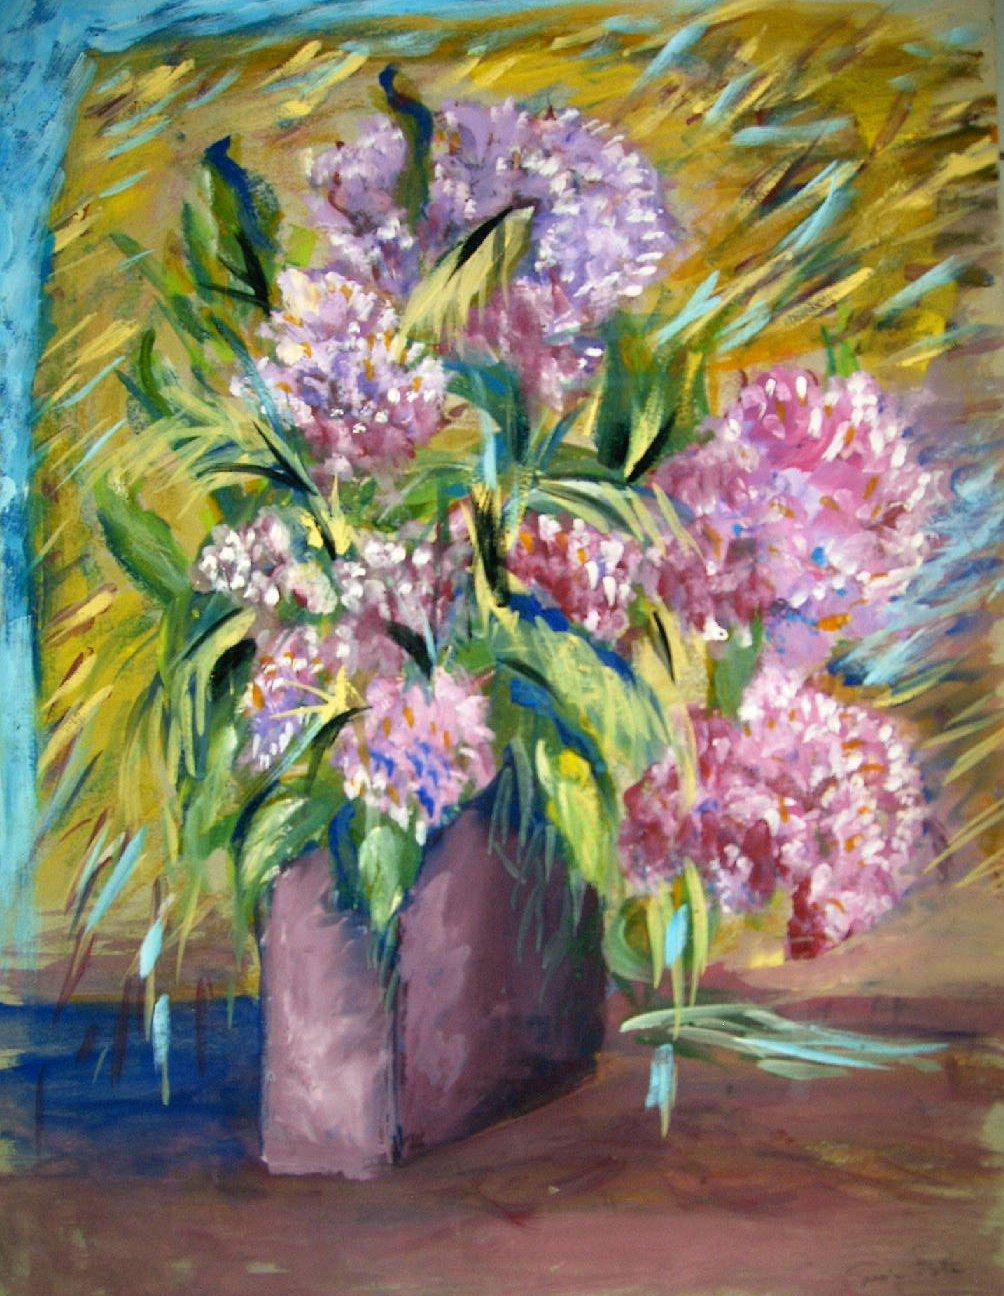 Vasi di fiori dipinti lisboantigua for Vasi di fiori dipinti